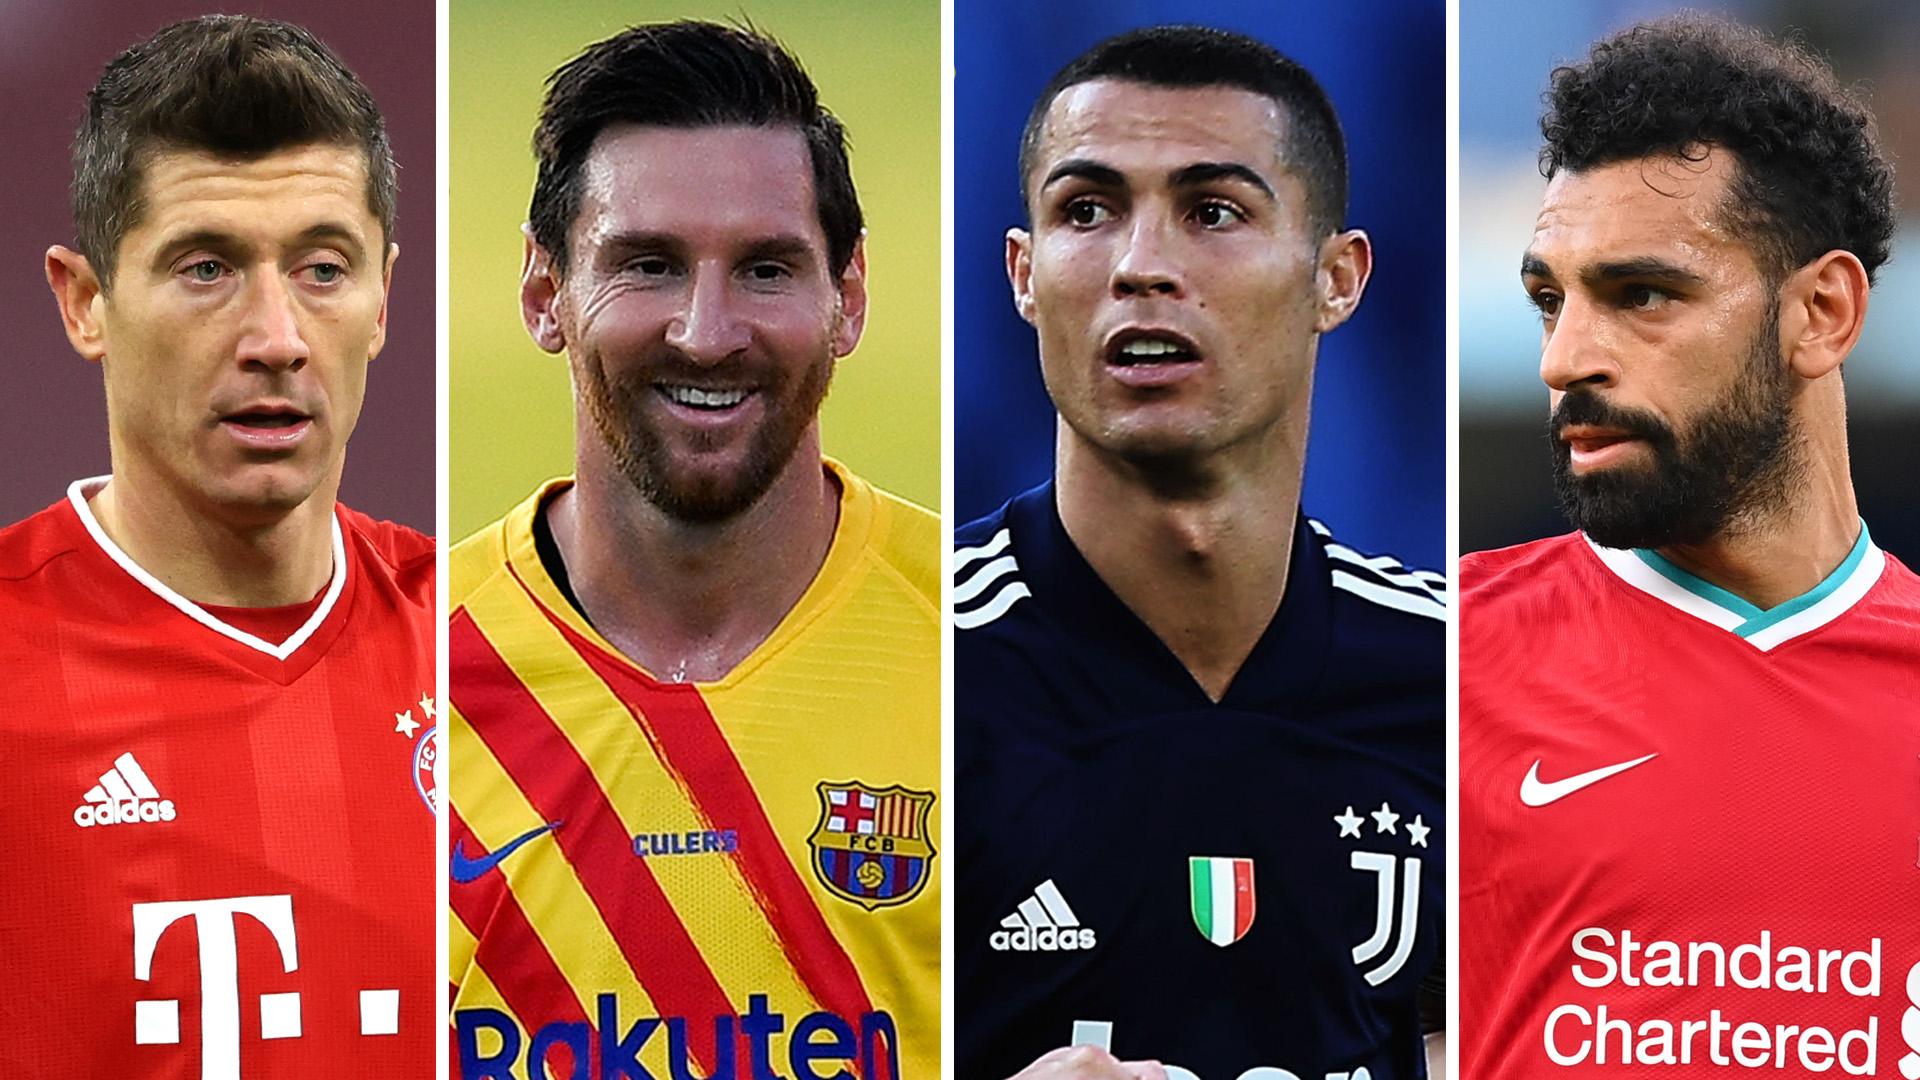 Lewandowski, Messi, Ronaldo & Salah all included as FIFA The Best nominees revealed